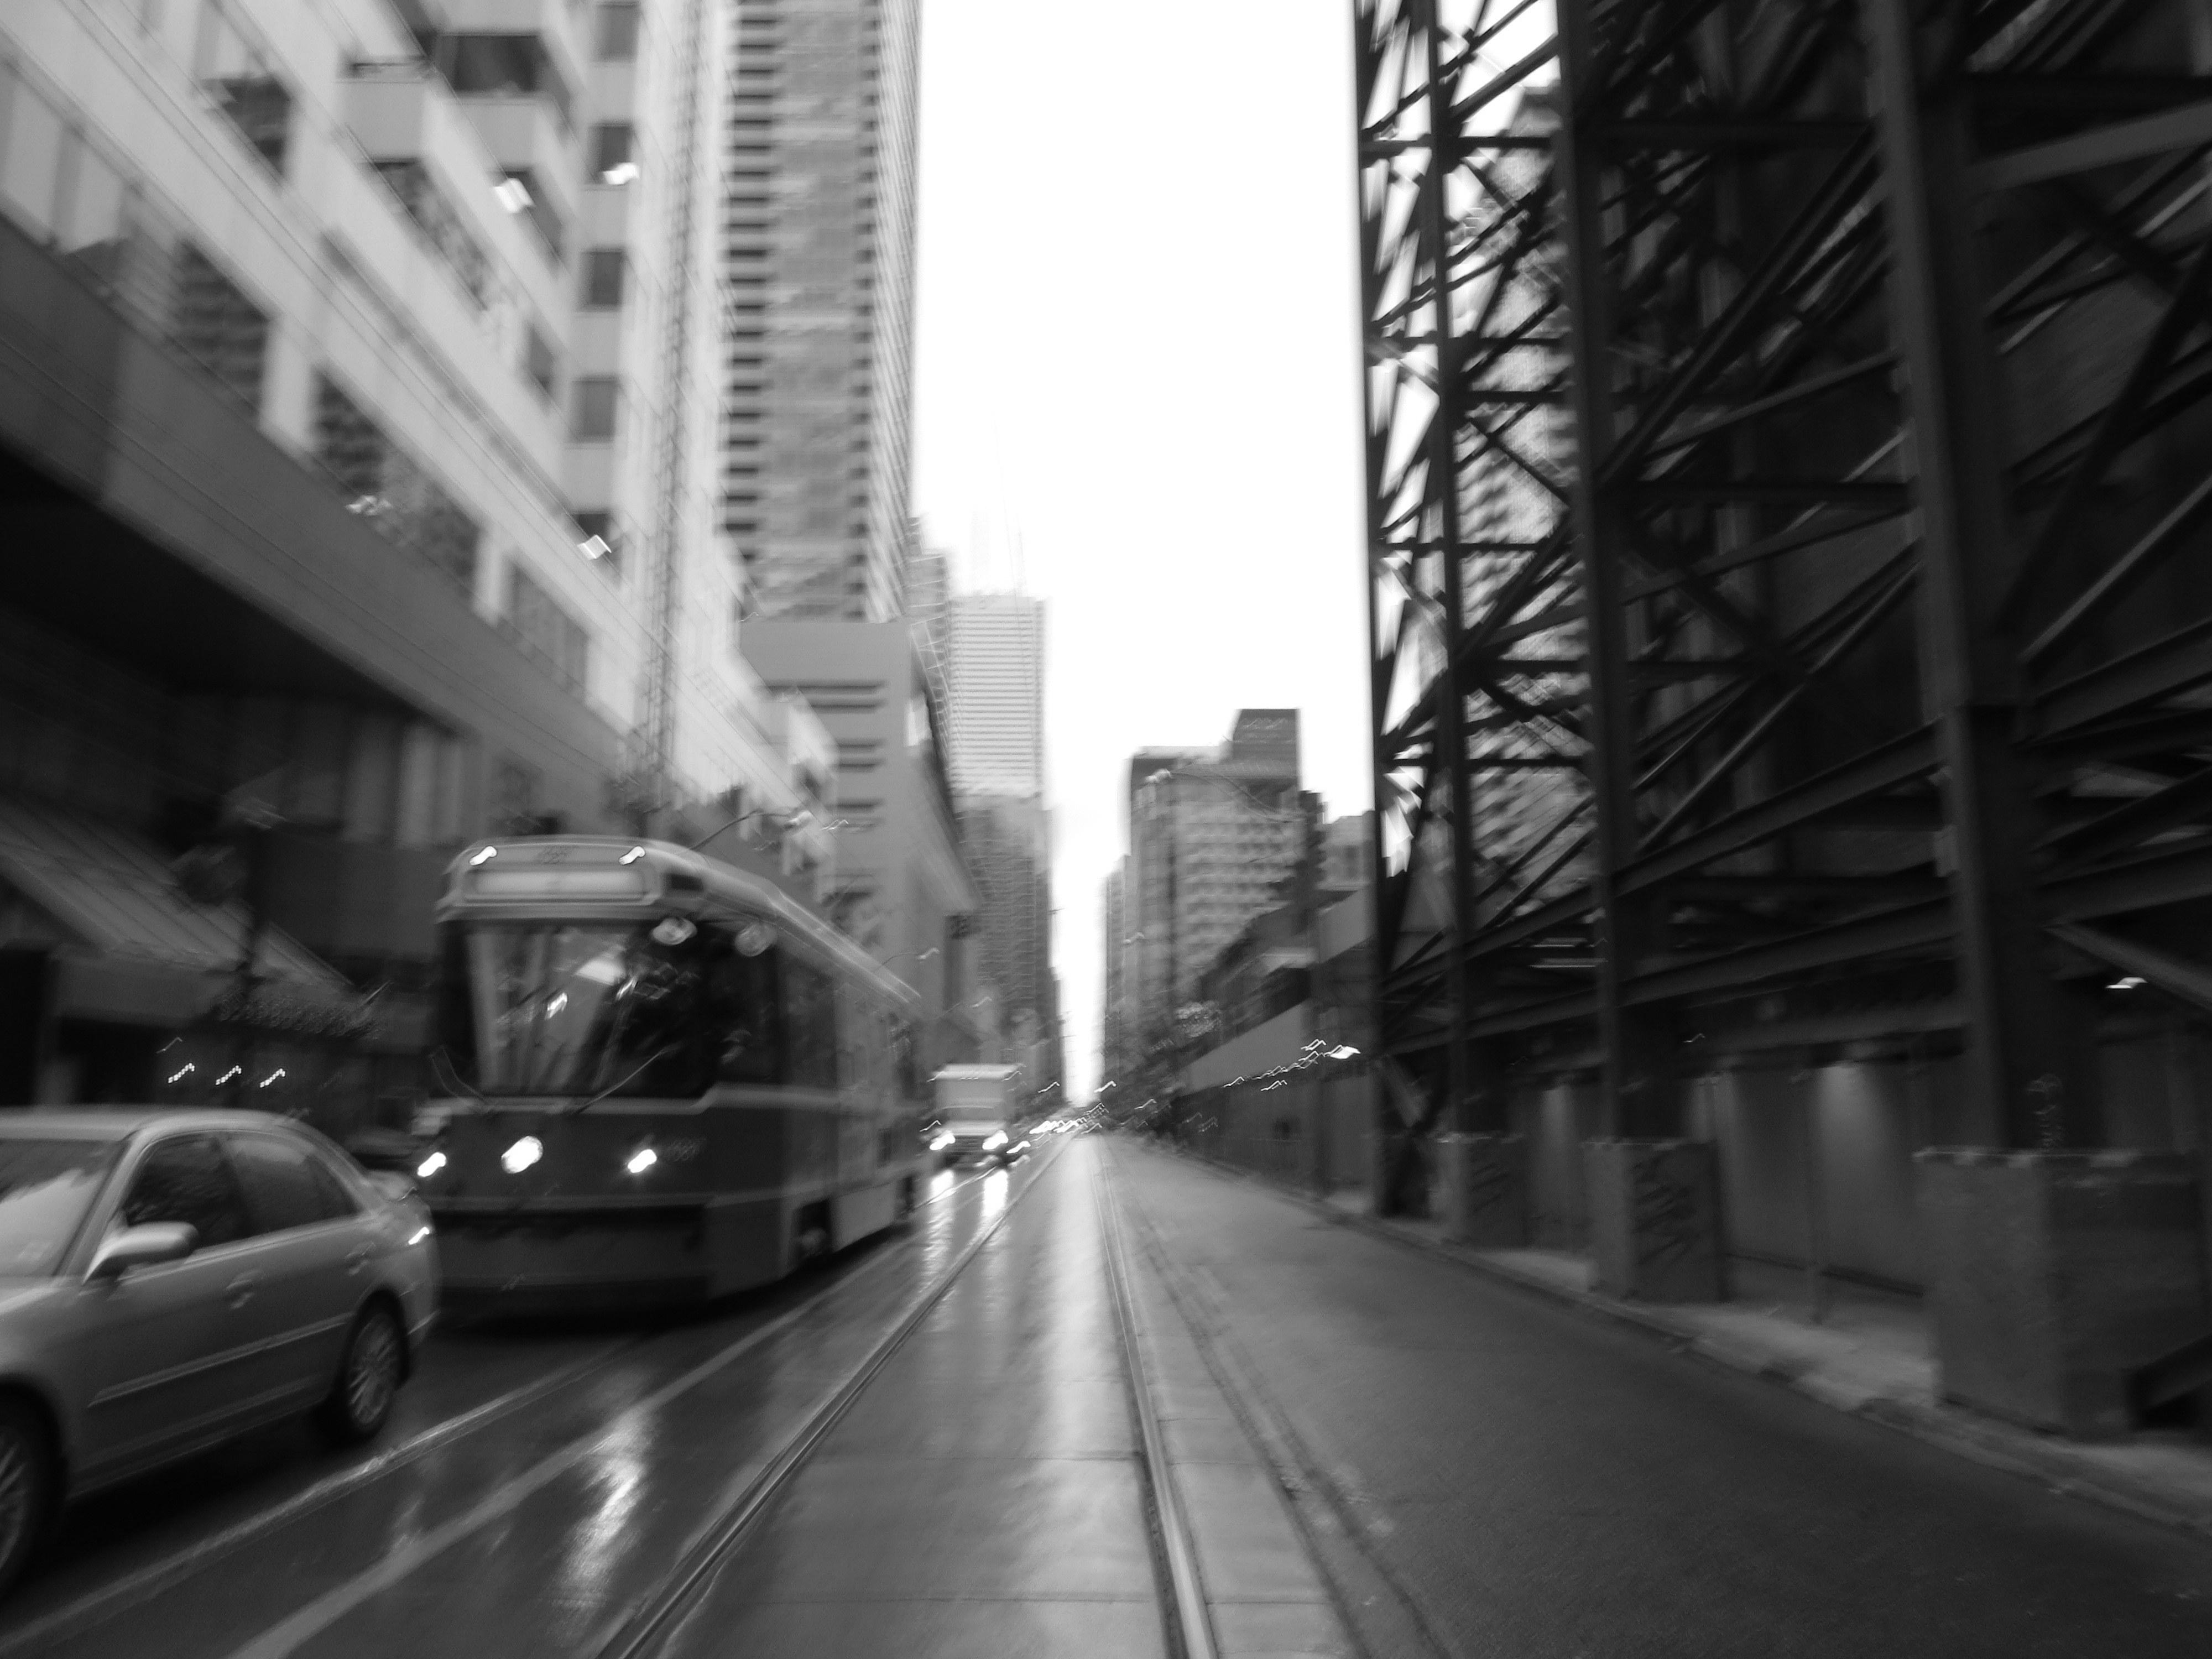 Tram away